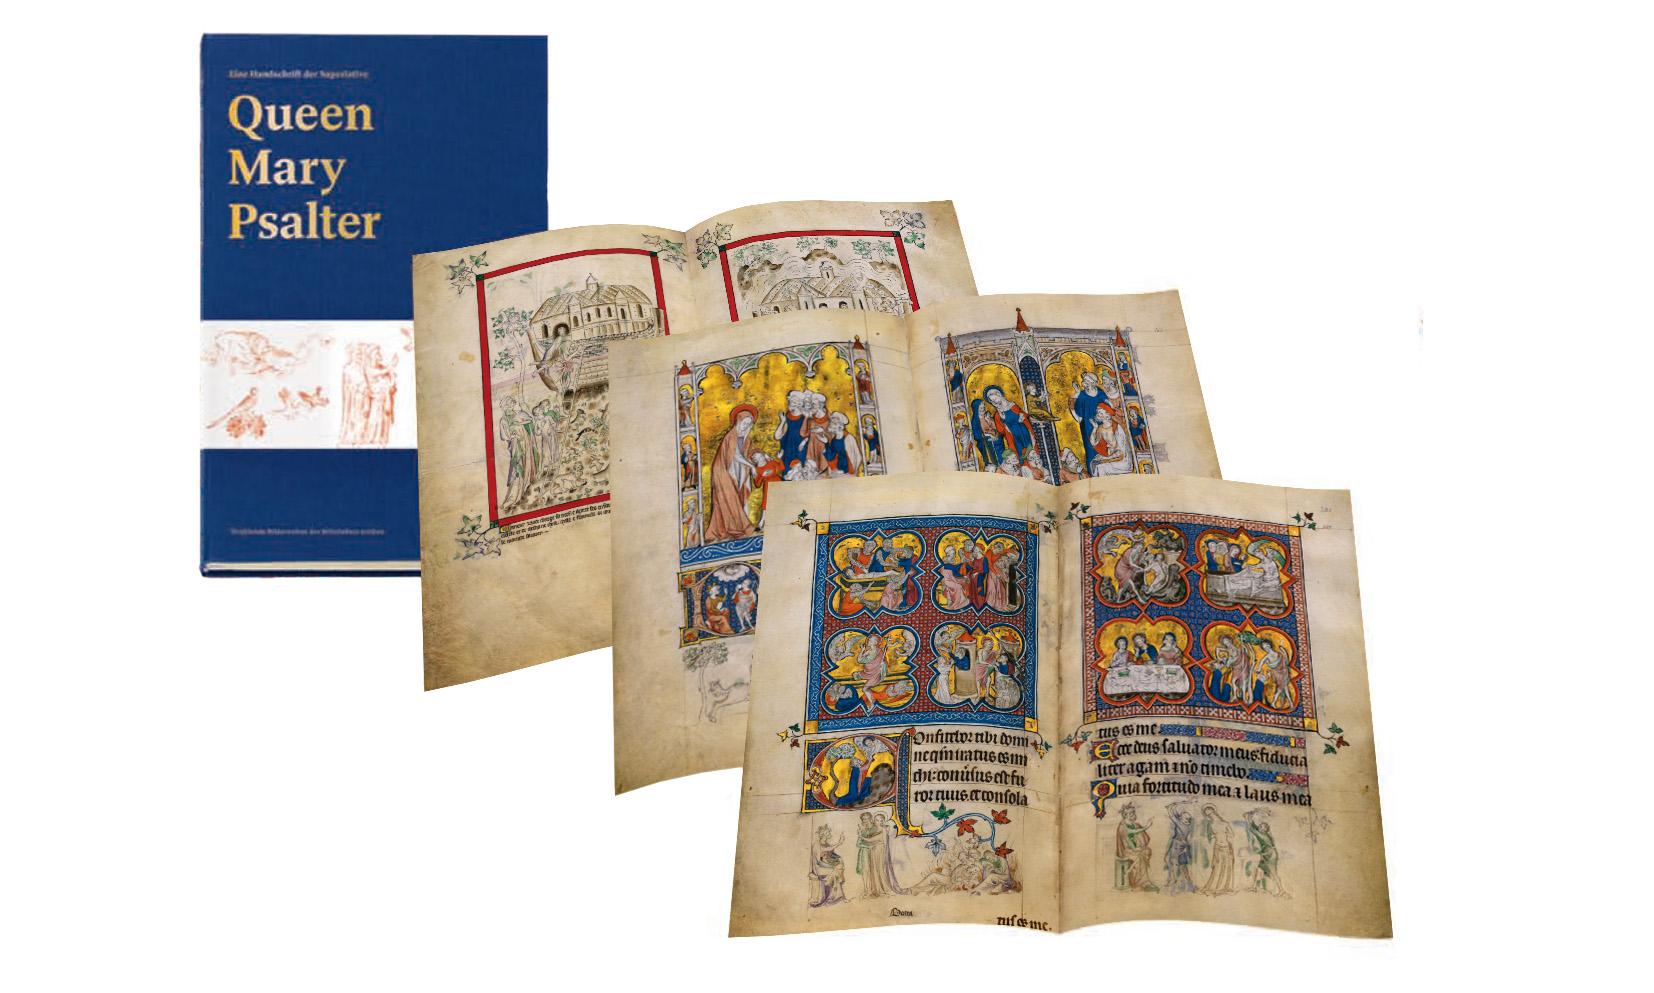 Queen-Mary-Psalter, Faksimiledossier